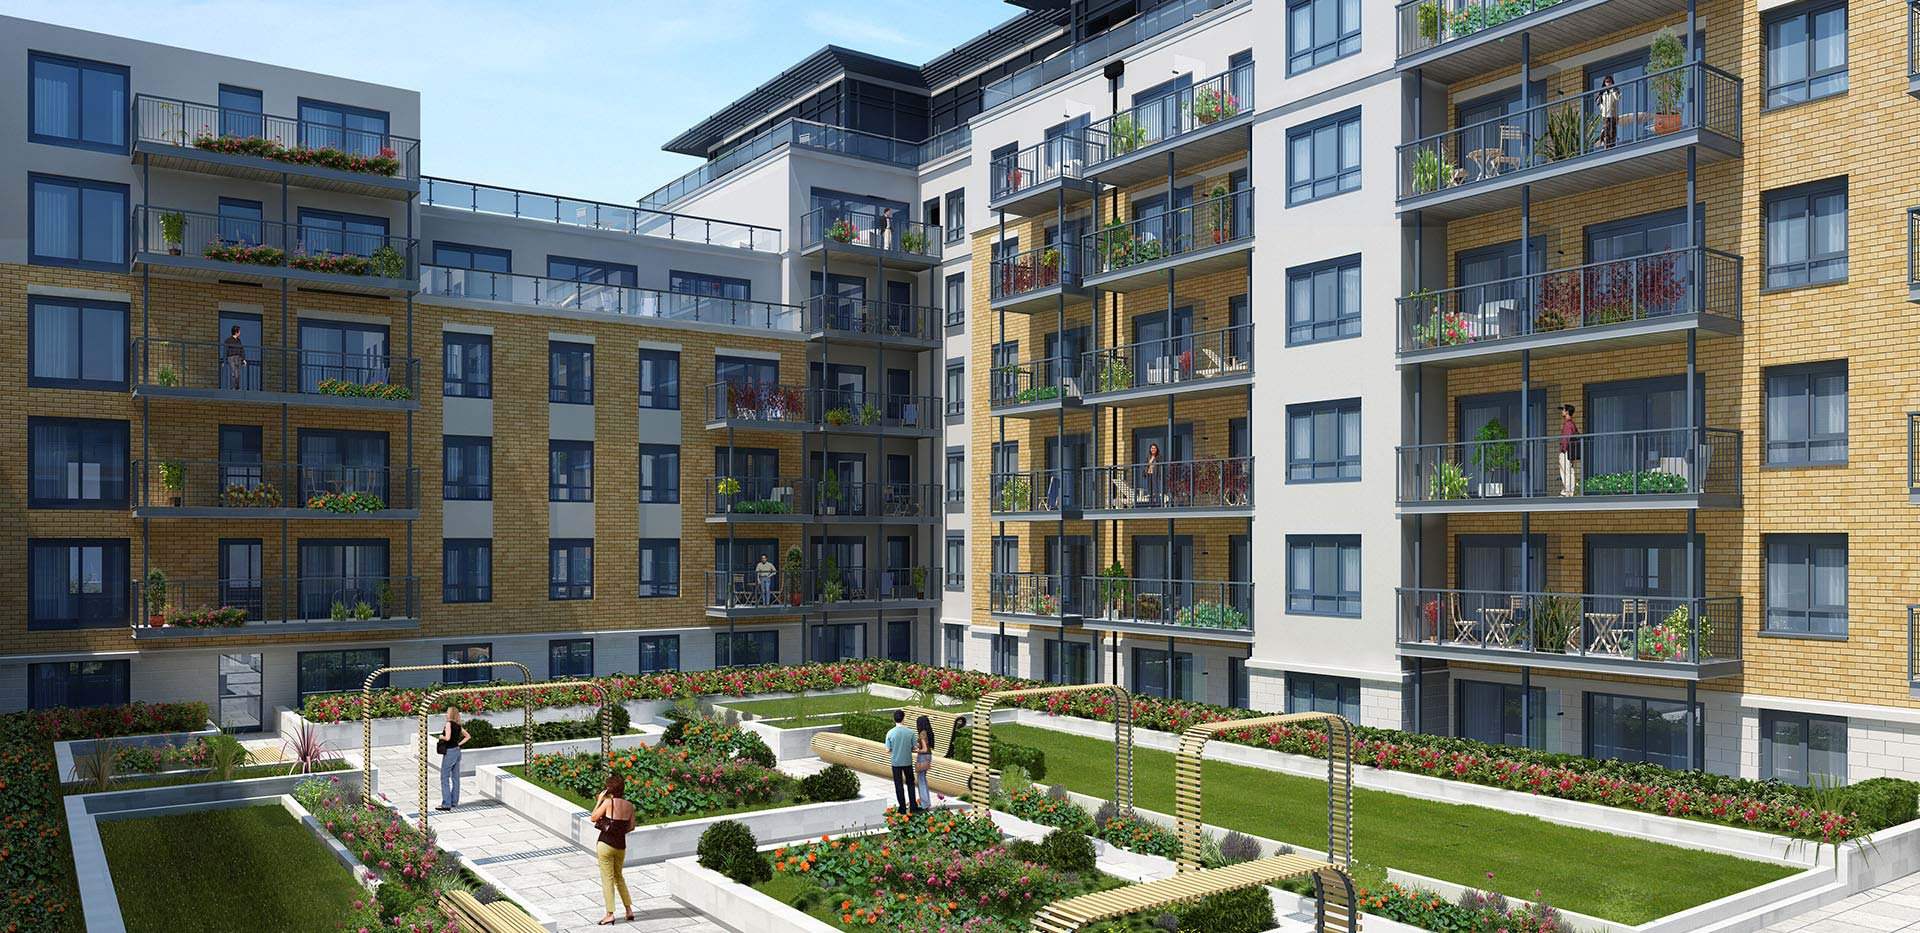 St George, Beaufort Park, Constantine Apartments, Exterior Courtyard